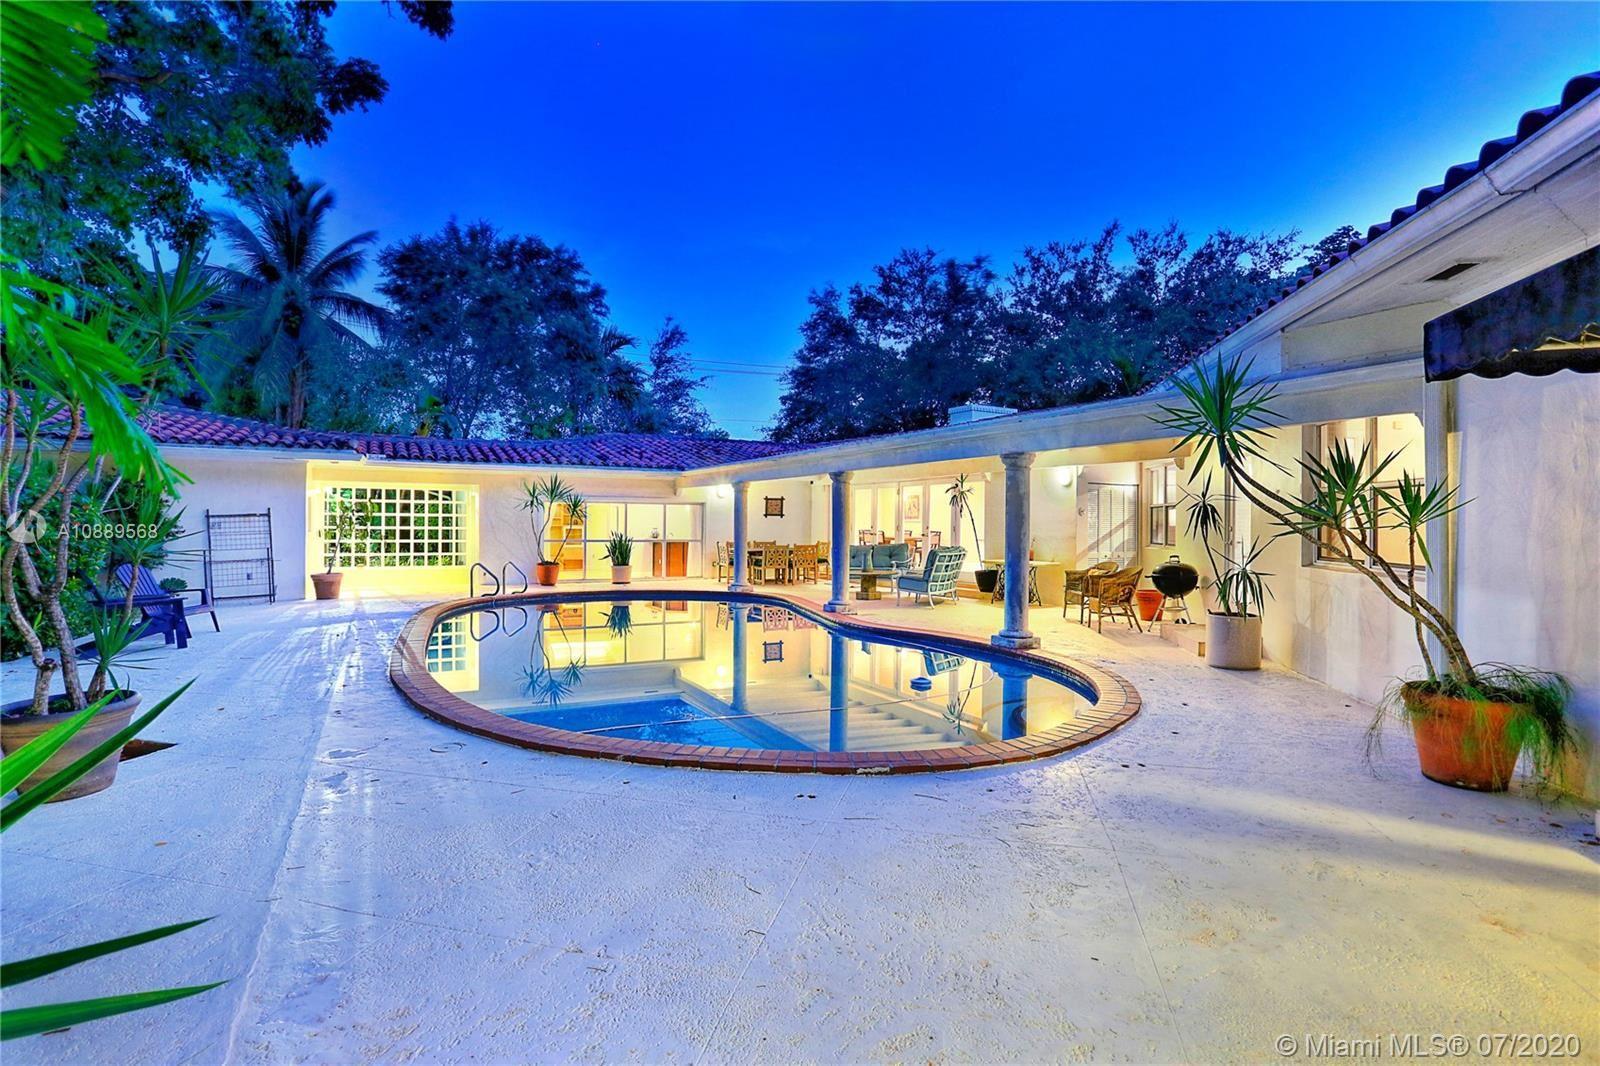 5409 Riviera Dr, Coral Gables, FL 33146 - #: A10889568